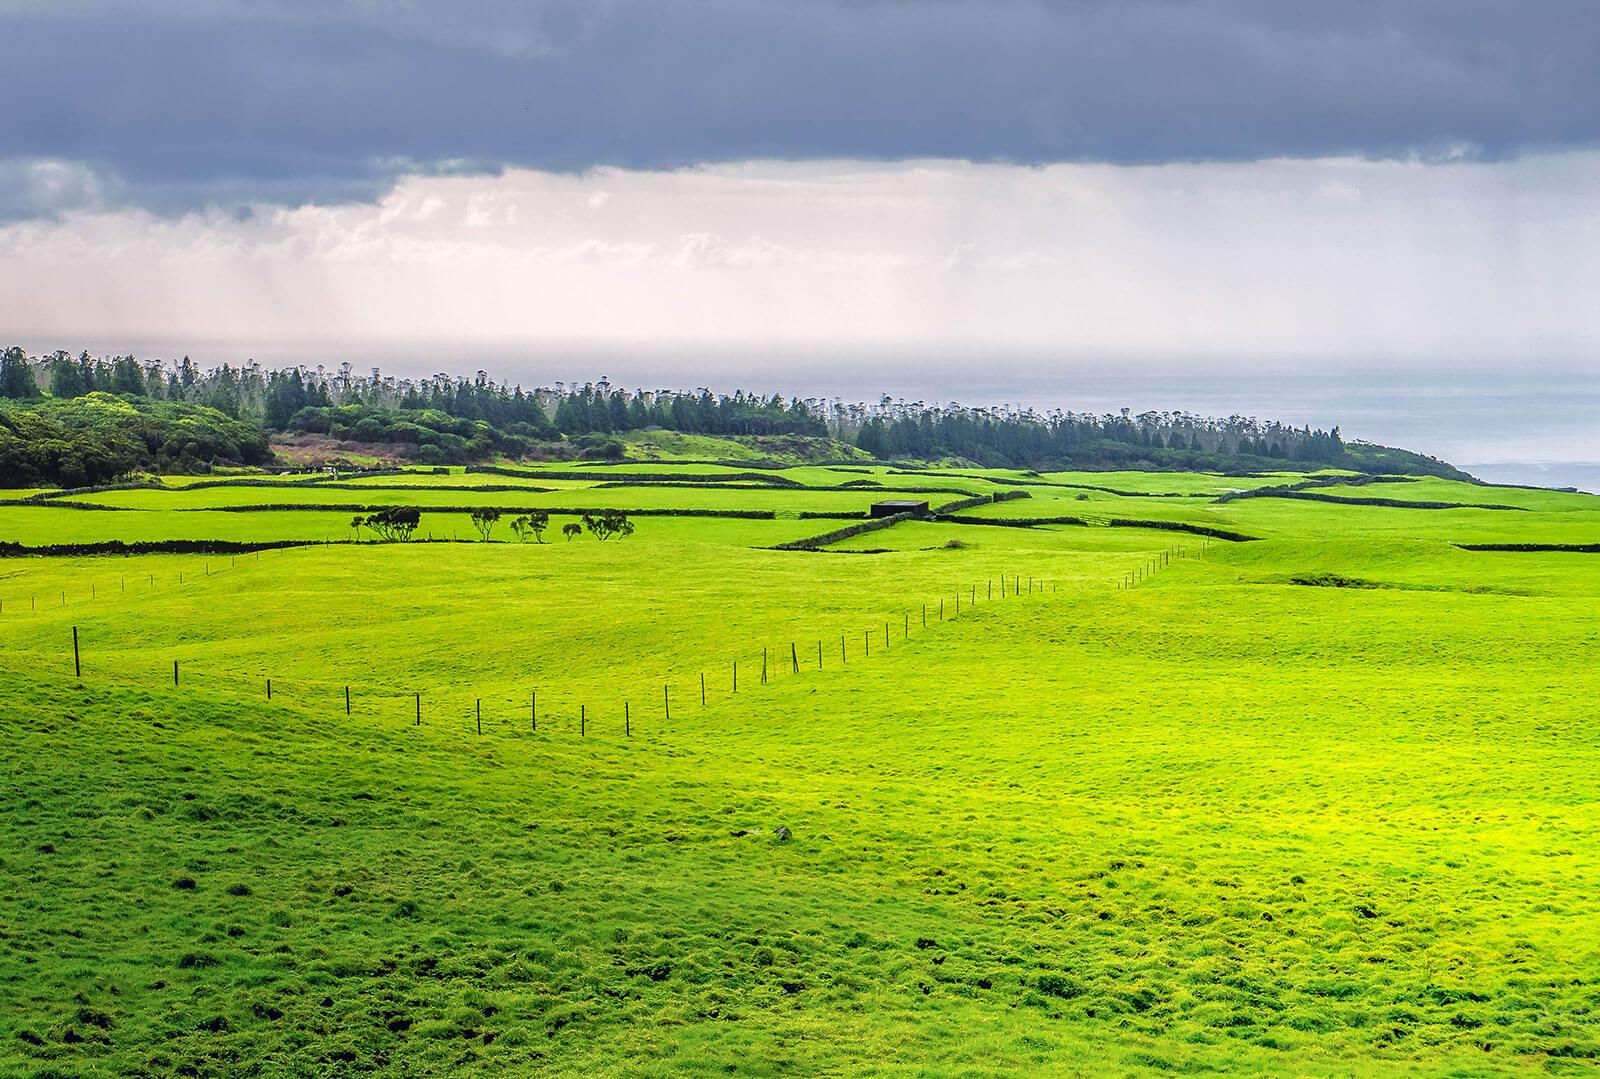 Passeio pela Terceira by Antero Ávila